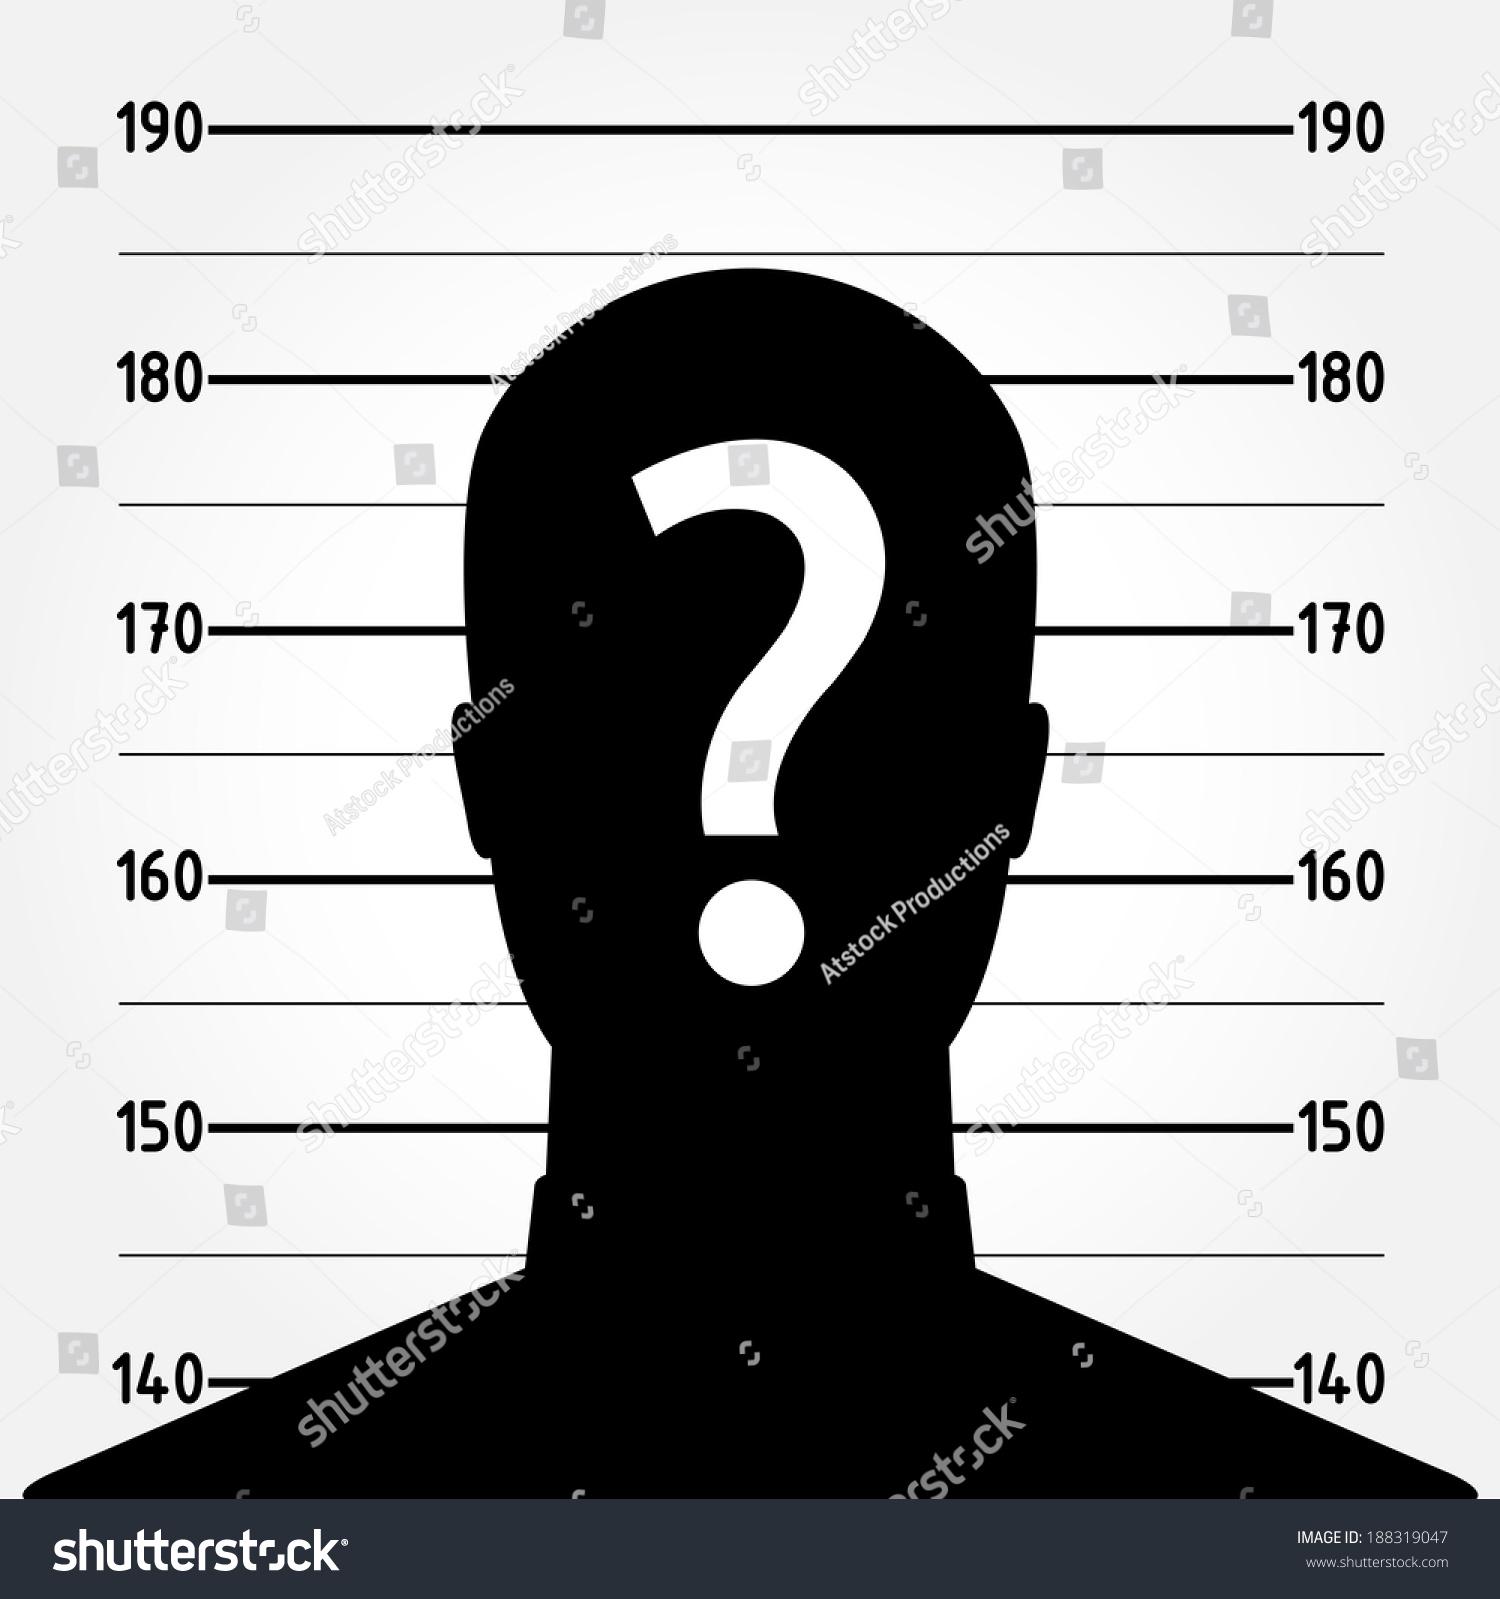 Suspect suspect stock photos, images, & pictures shutterstock